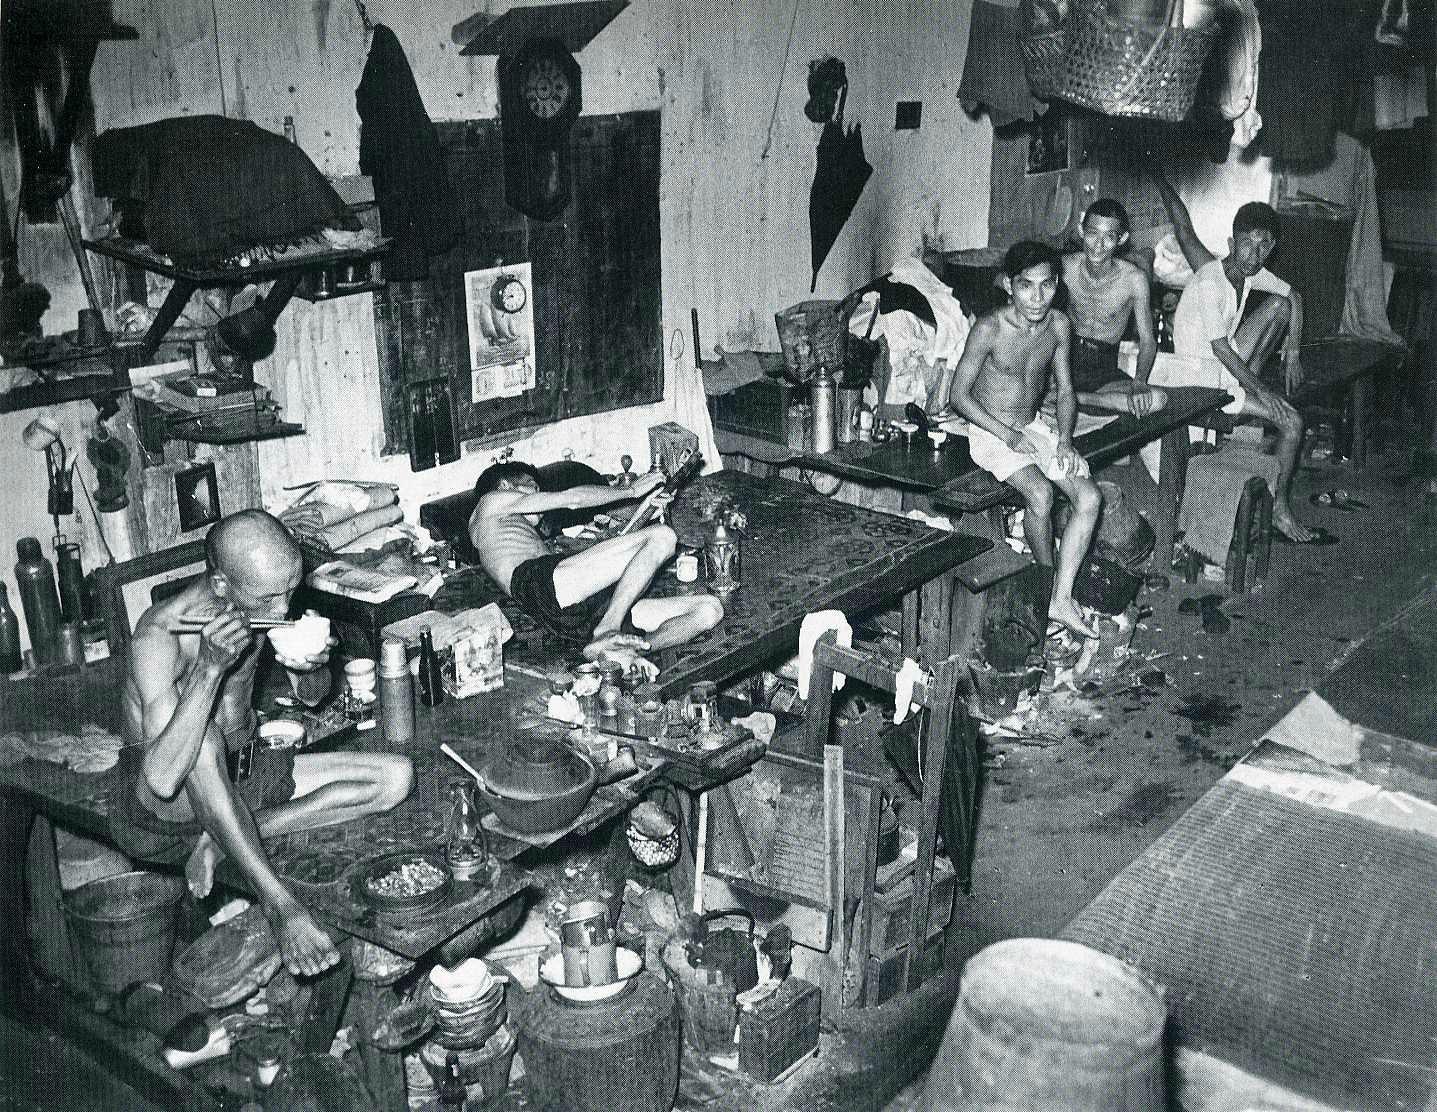 opium_den_singapore_1941.jpg